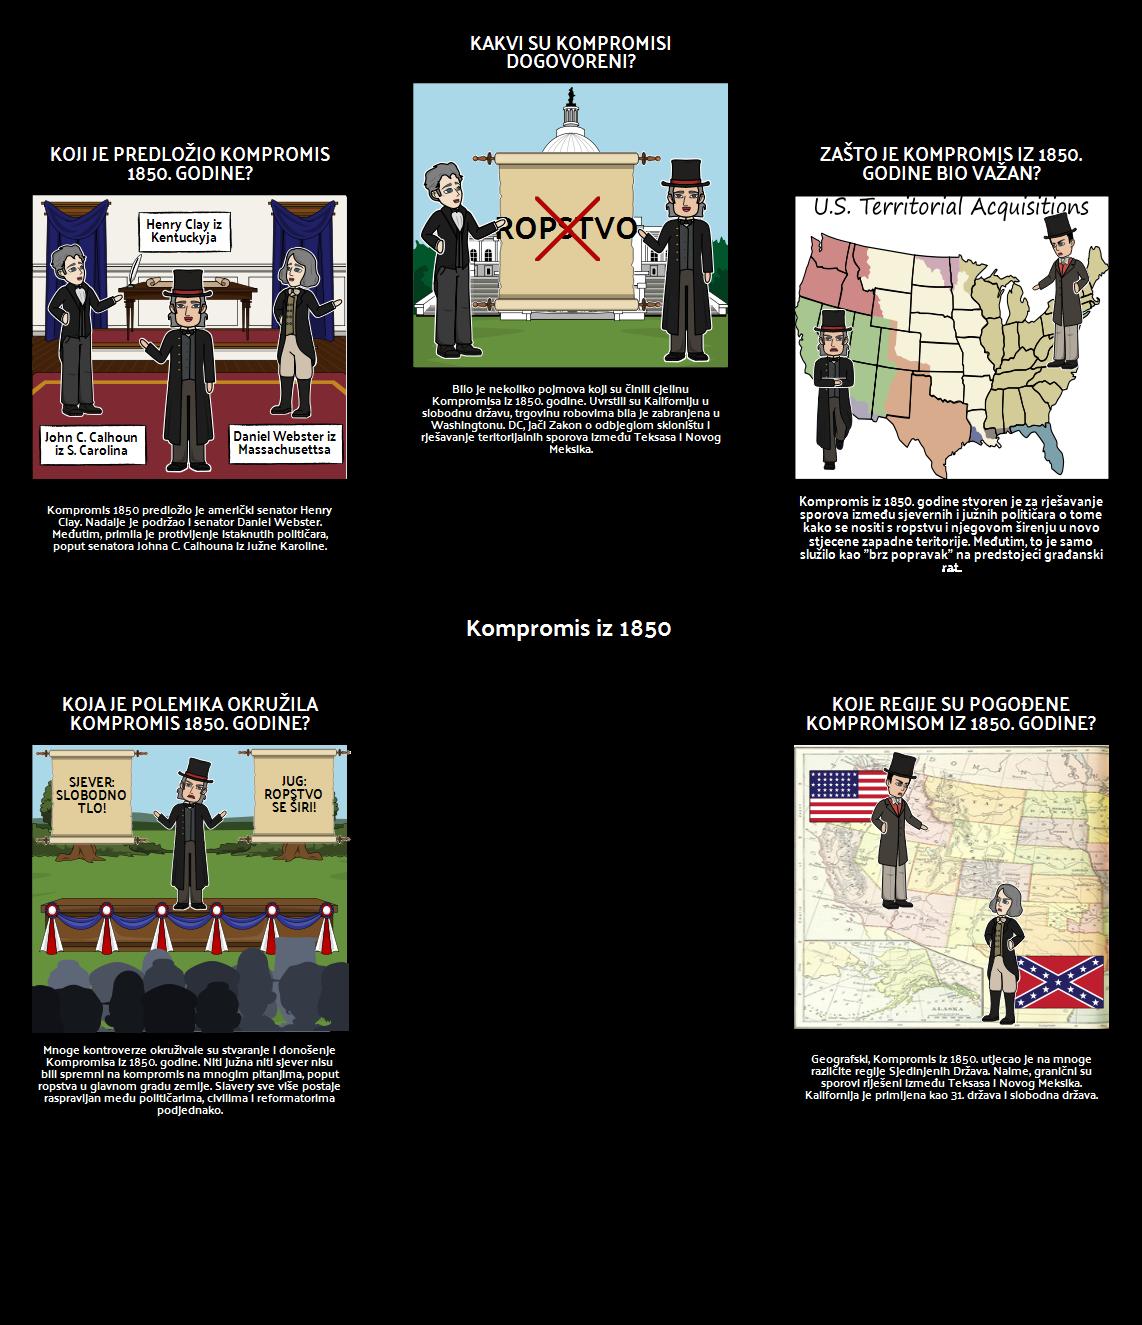 1850 - Amerika - kompromis 1850